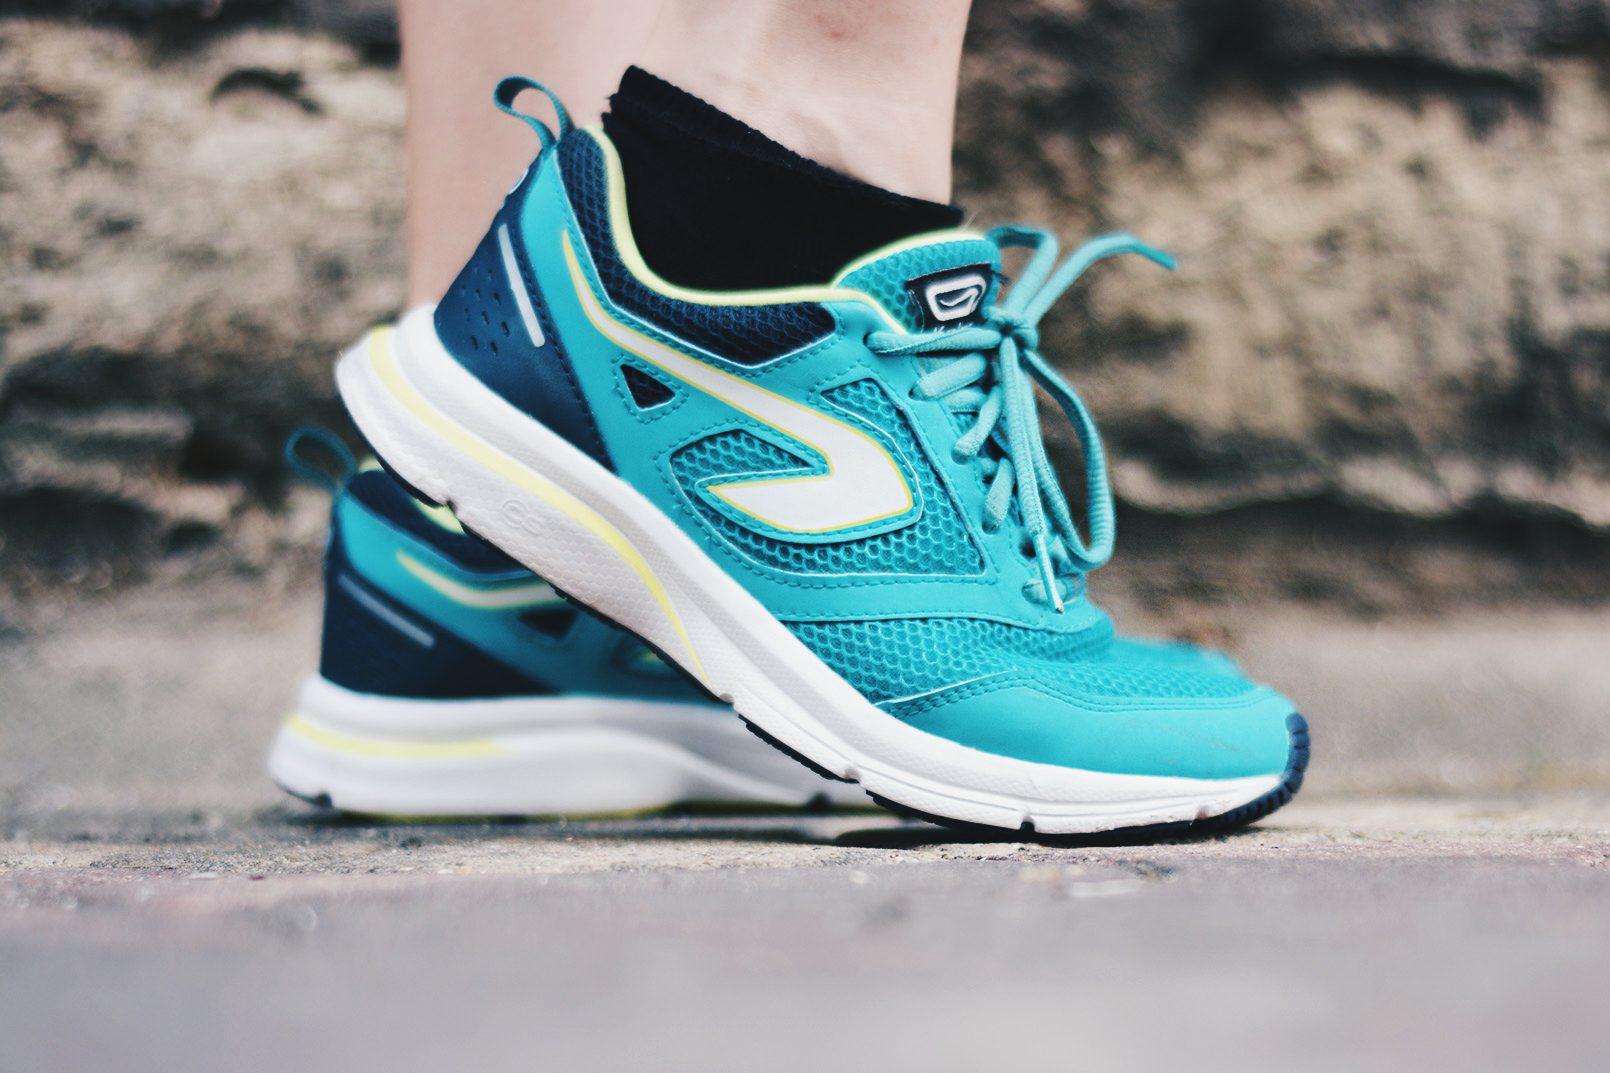 079389404 TEST | Kalenji Run Active Women's Running Shoes - Cam Dewoods